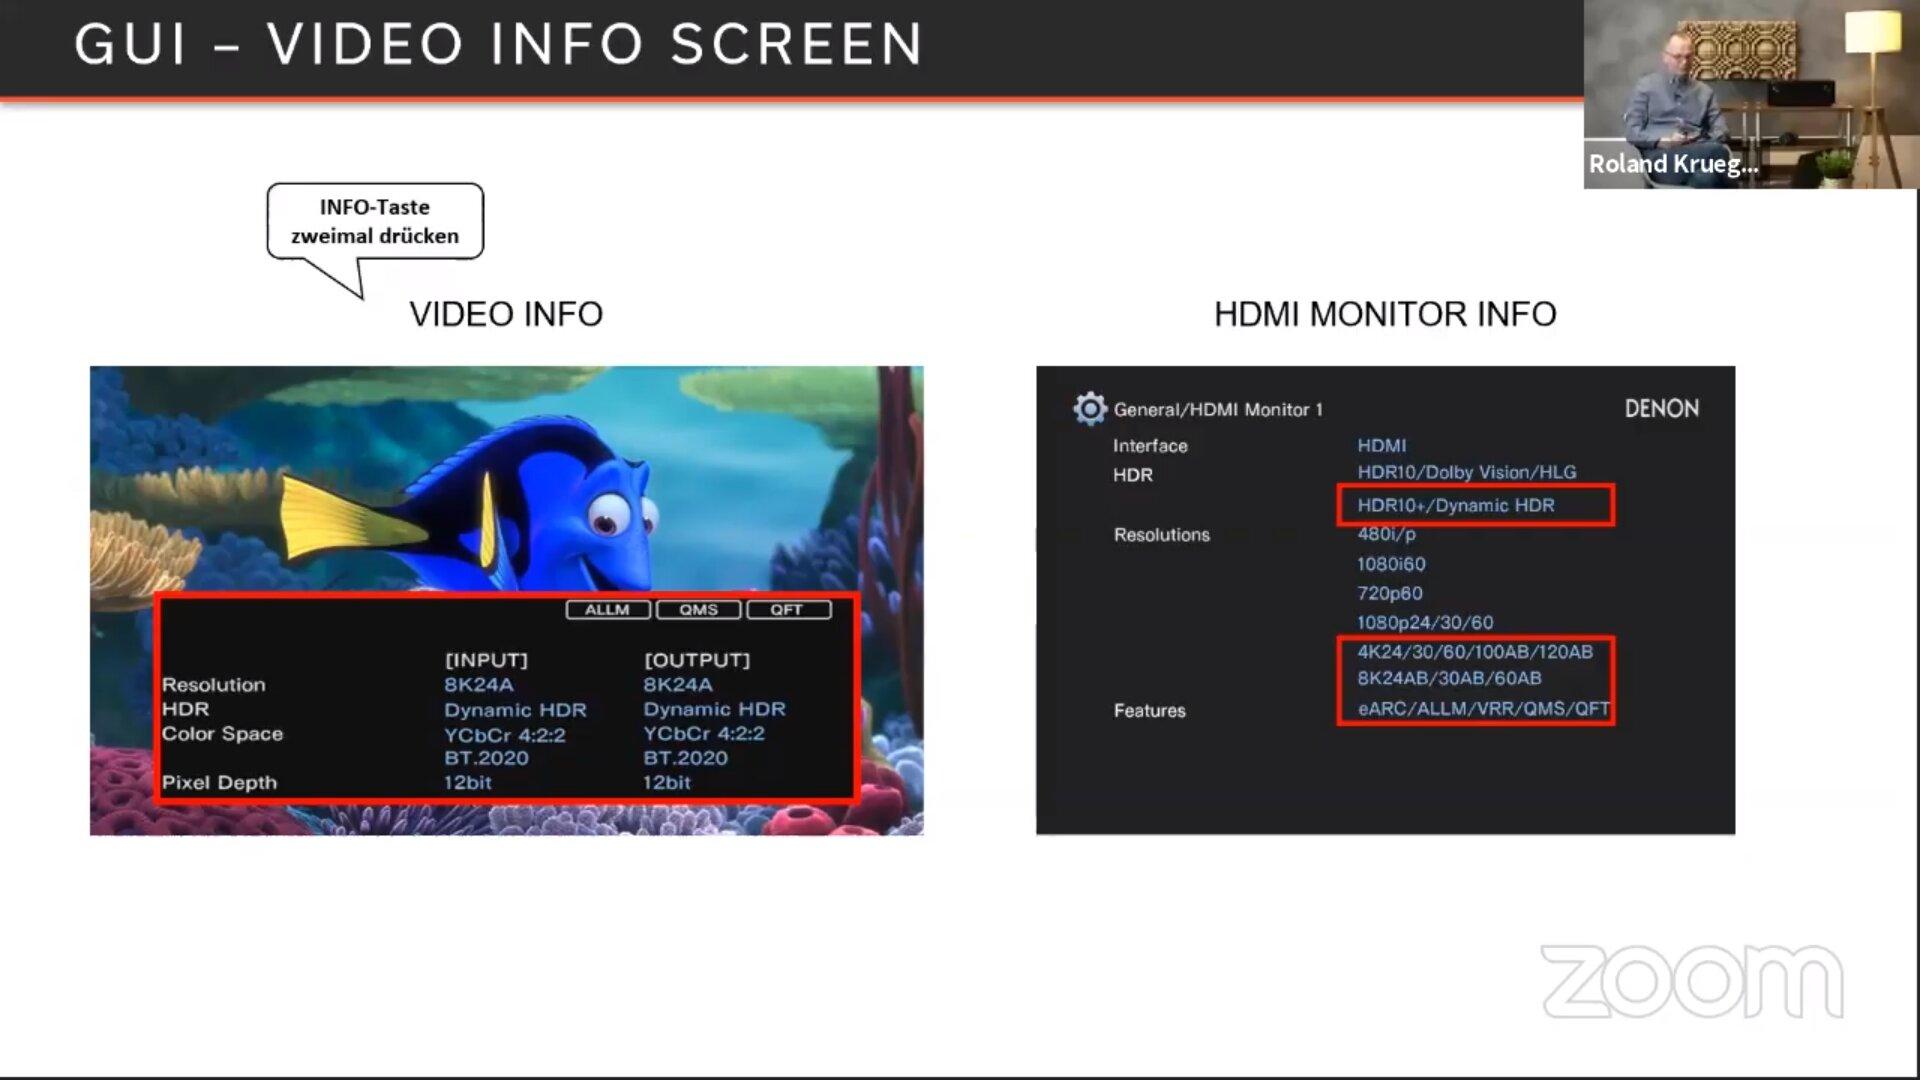 Neues Video-Info-Overlay